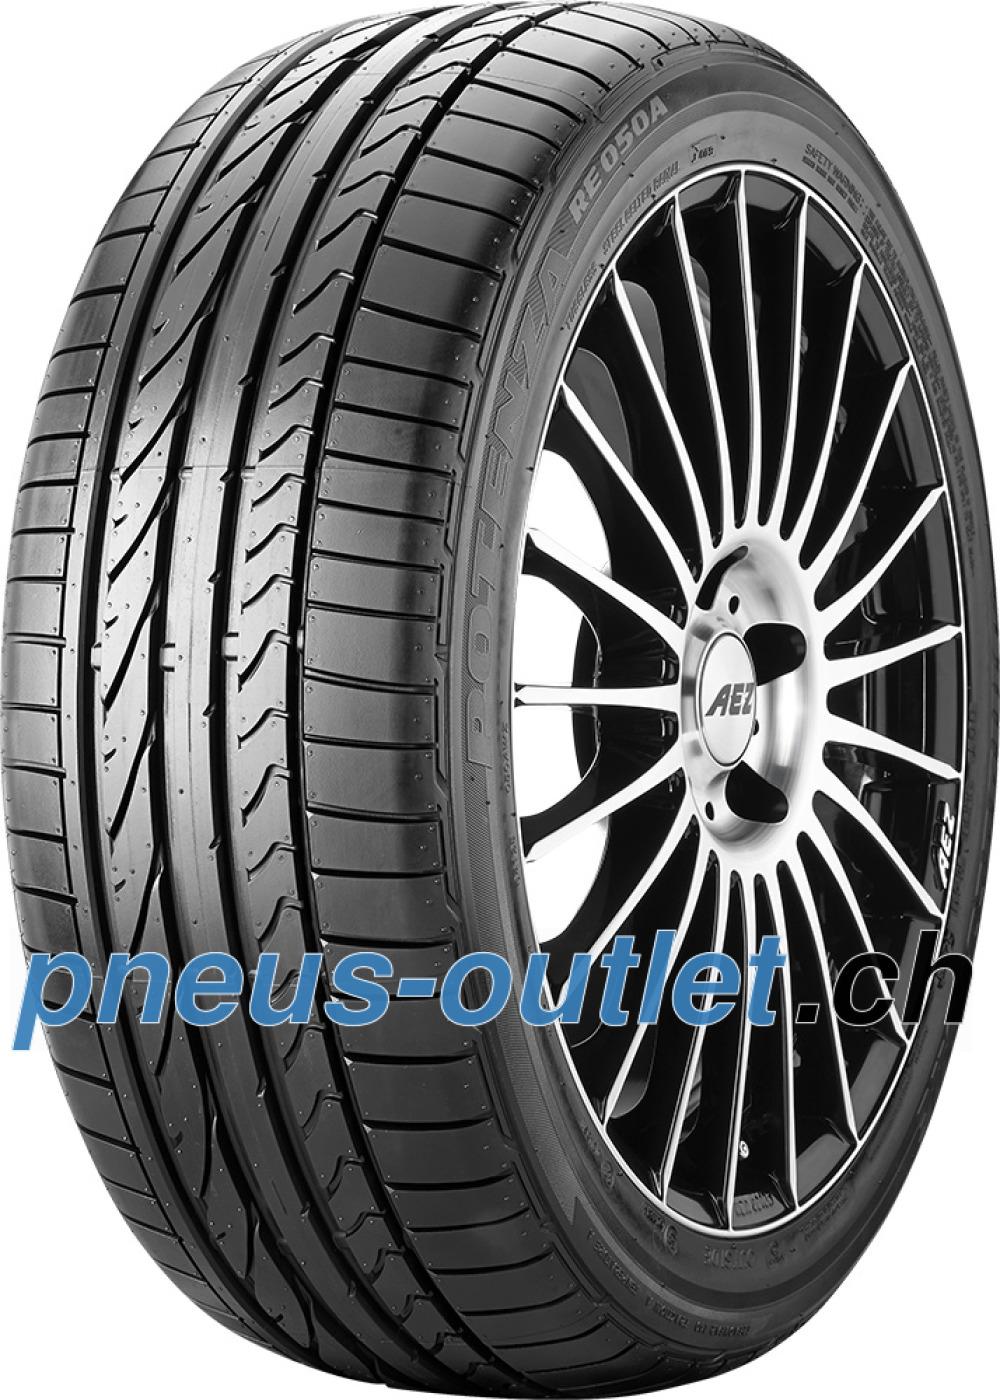 Bridgestone Potenza RE 050 A ( 225/50 R17 94V avec protège-jante (MFS) )